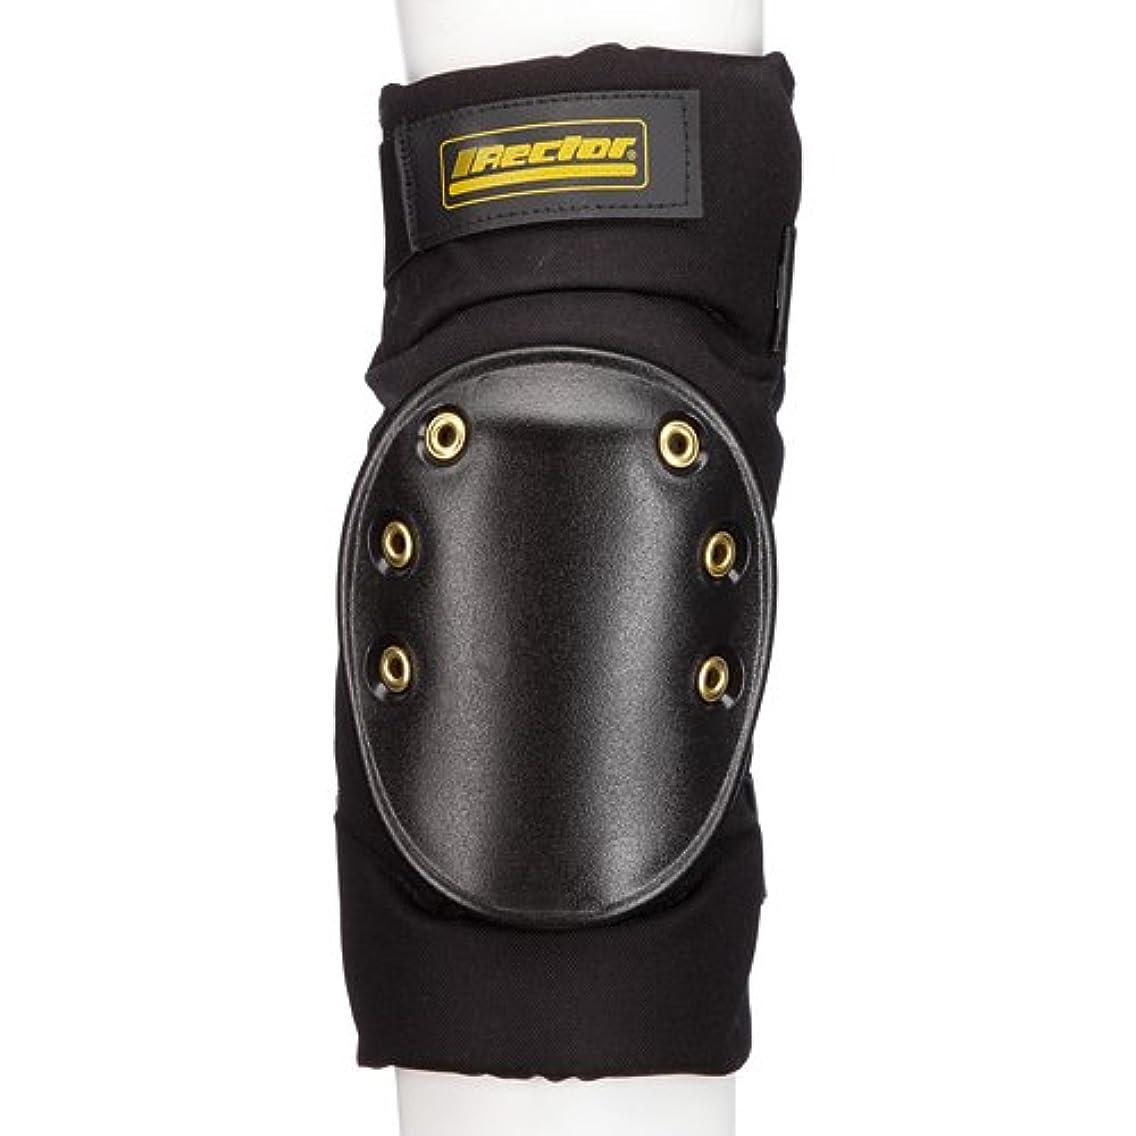 Rector 3100-2-00-0 Fat Boy Knee Pad, Nylon Fabric, Small, Black (Pack of 2)